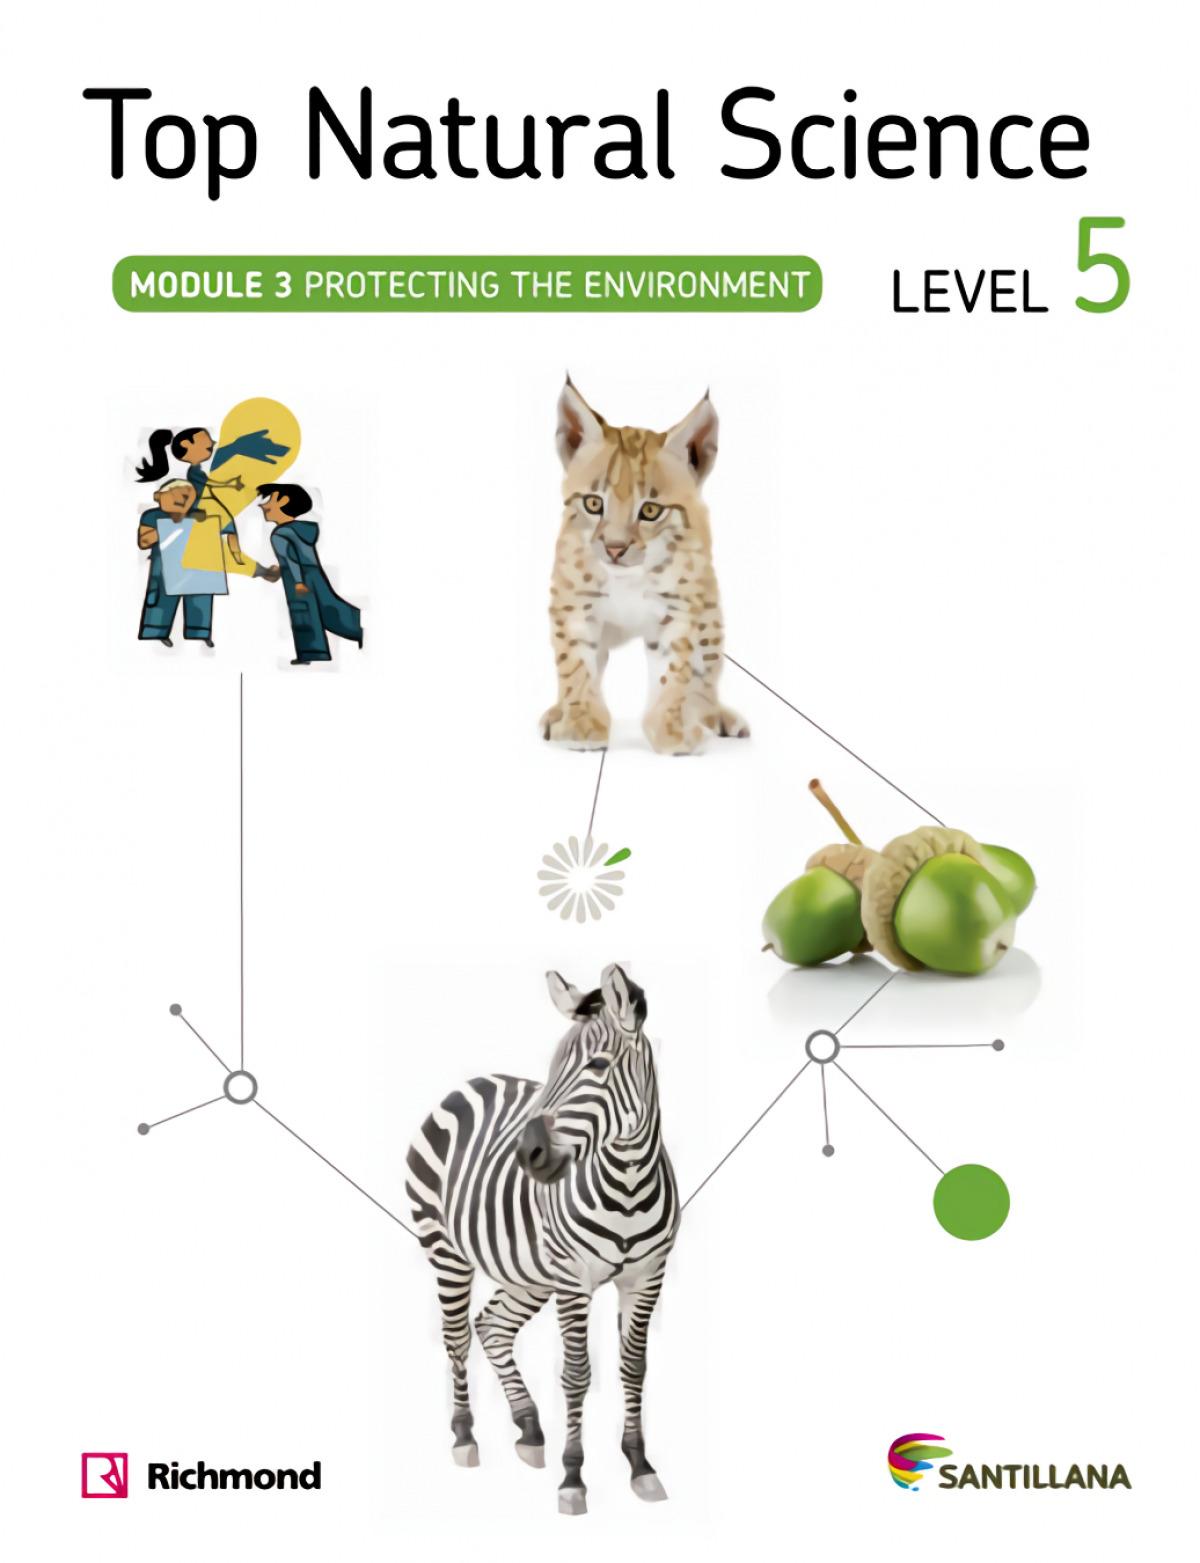 Top natural science 5. Protecting envoir